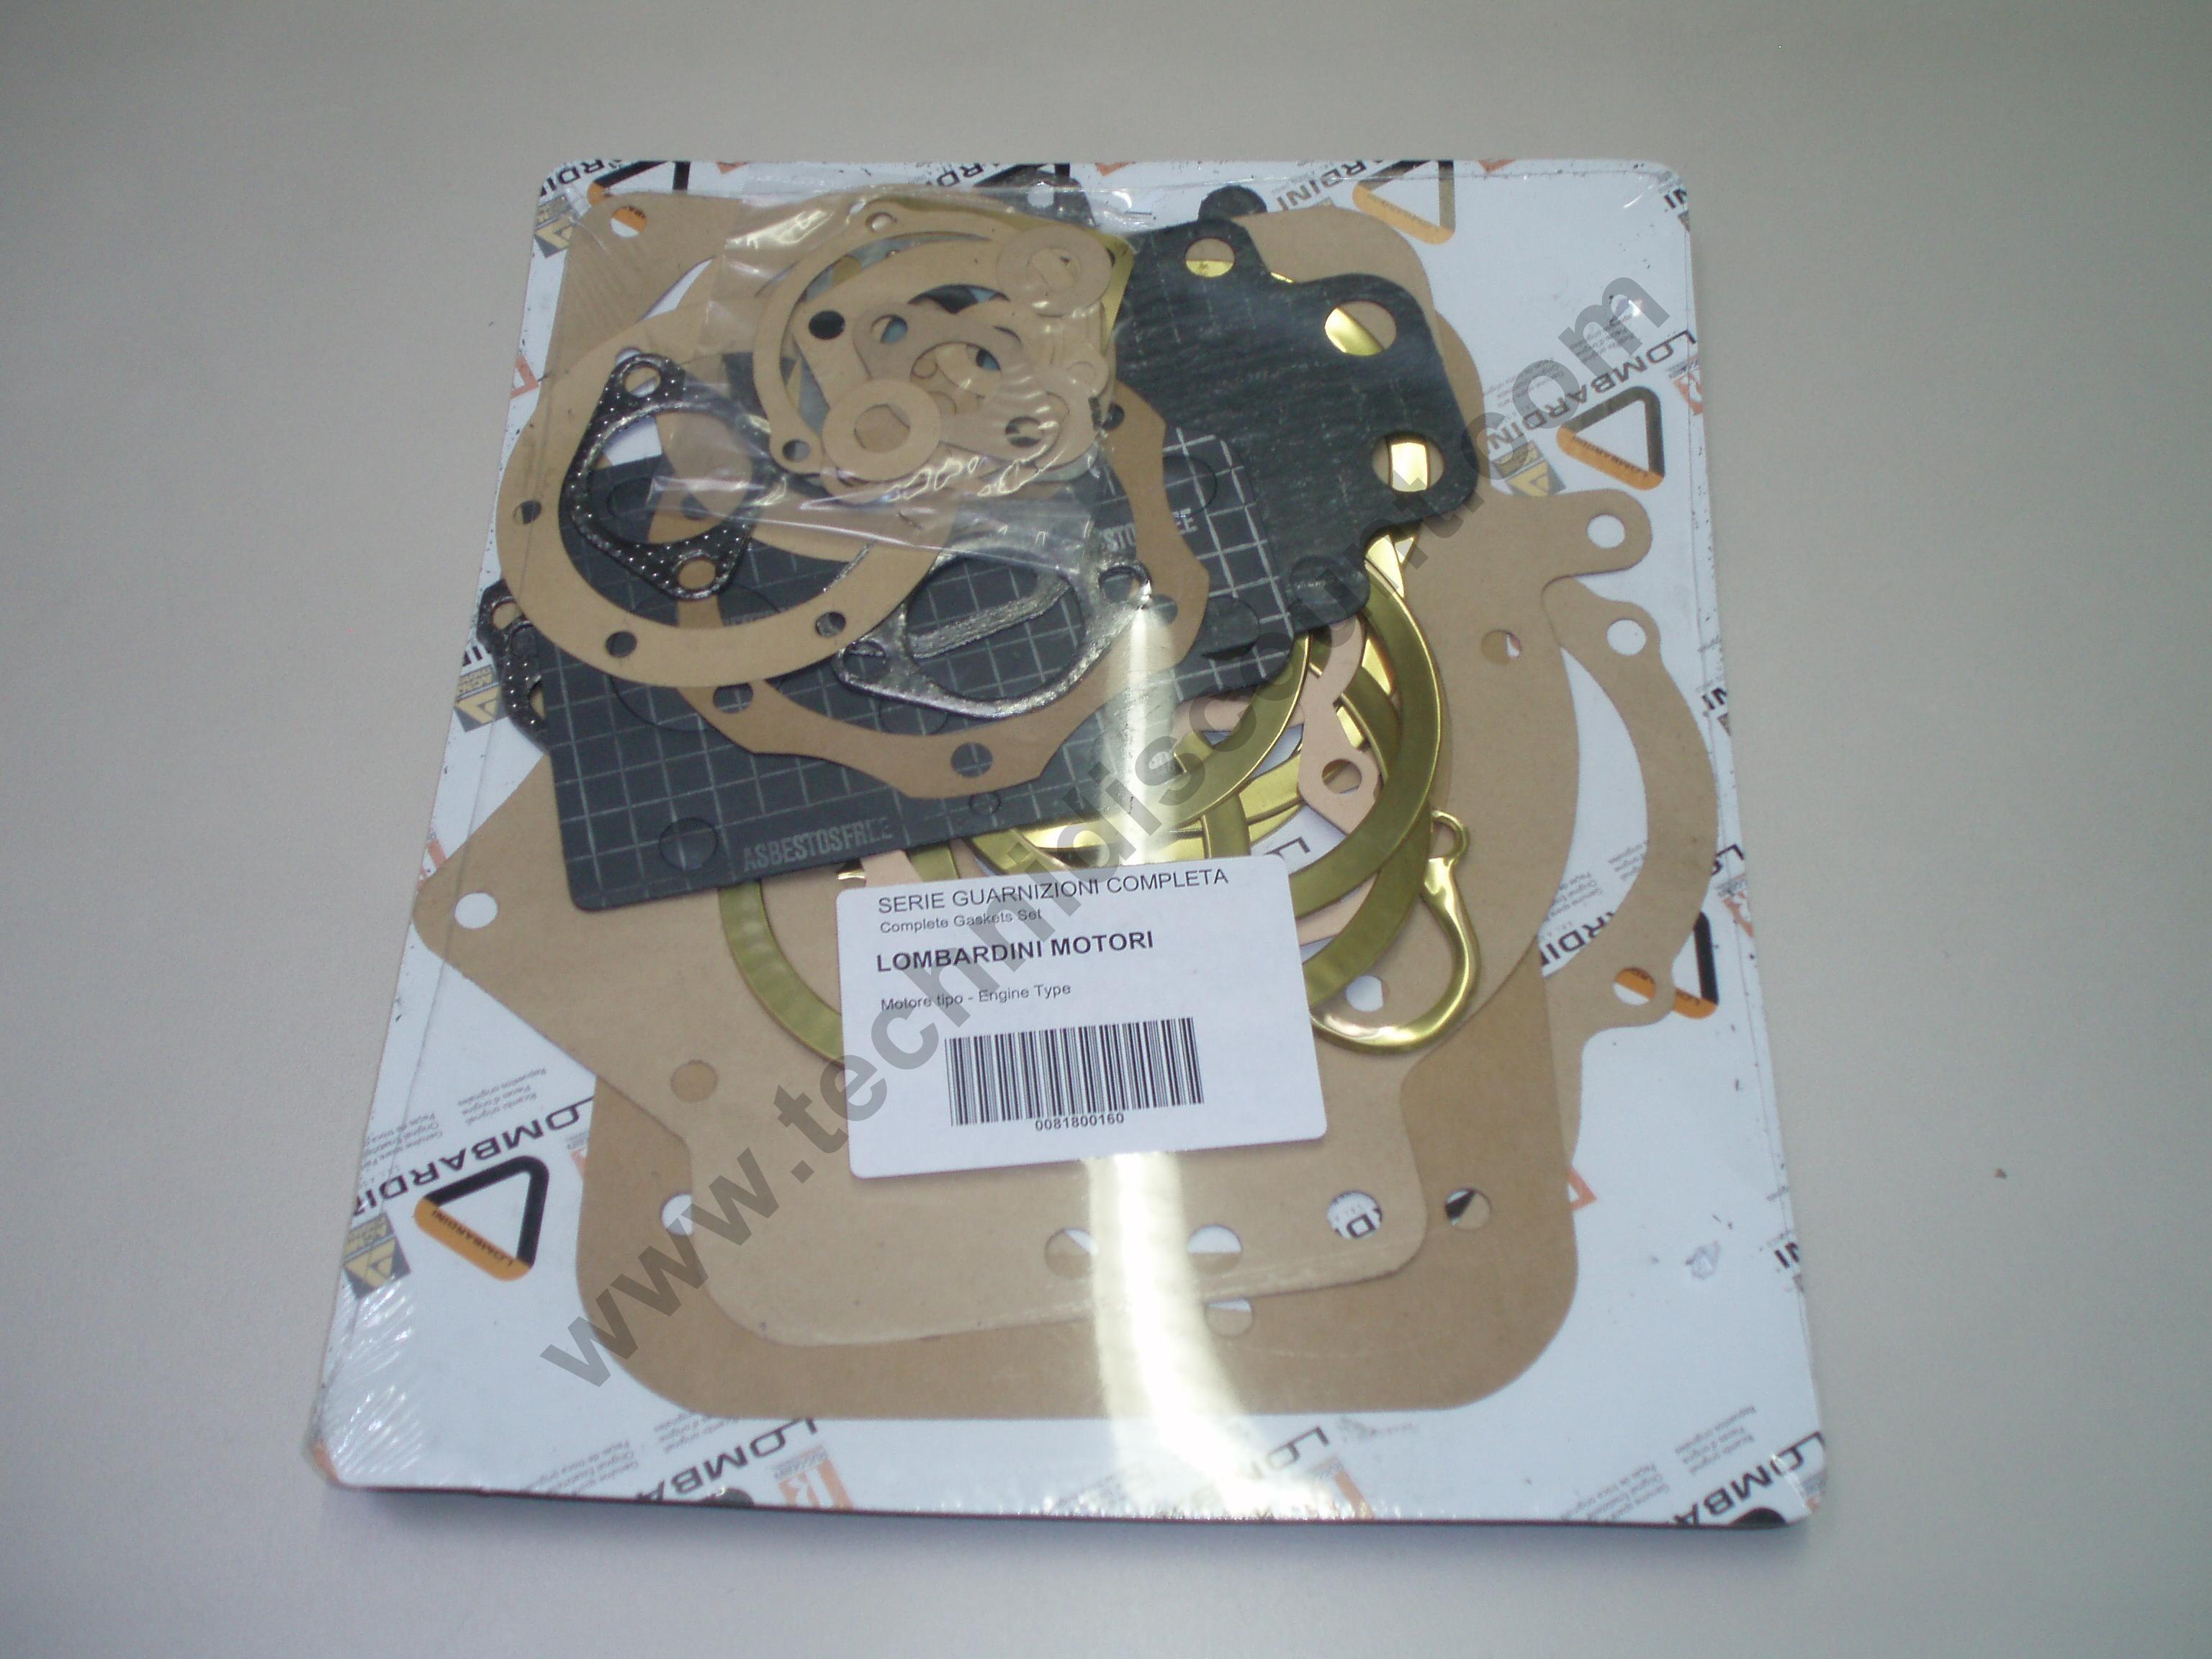 Pochette joints LDA90/2 LDA78/2 LOMBARDINI 8180016 / ED0081800160-S